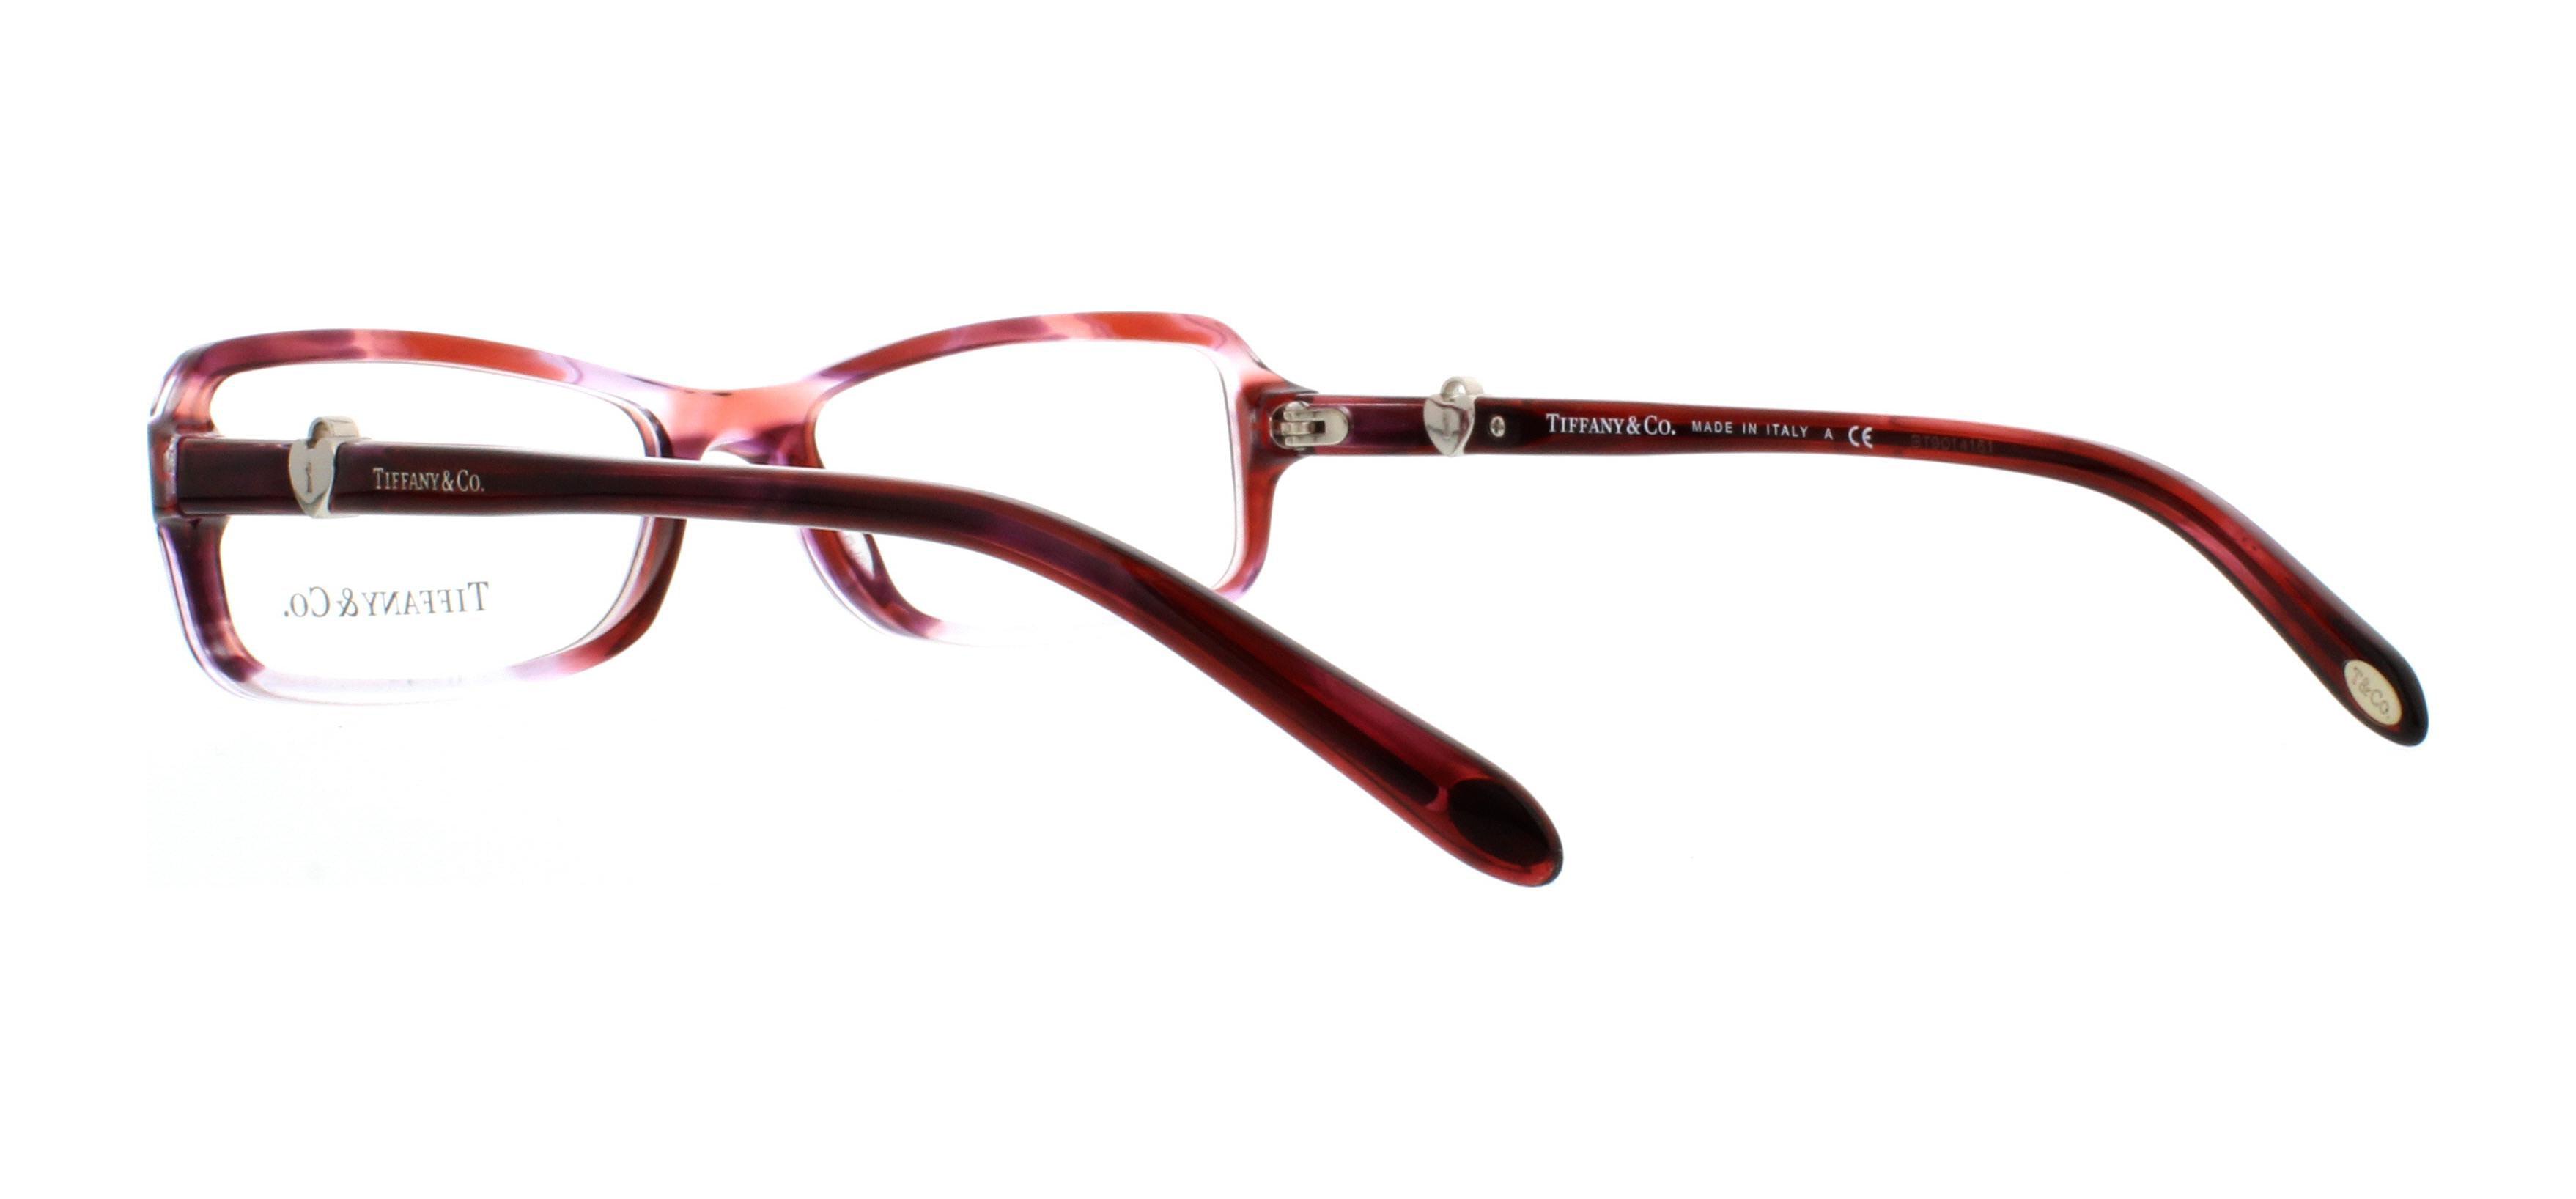 c3ba39f47882 TIFFANY Eyeglasses TF 2061 8144 Ocean Pink 52MM - Walmart.com